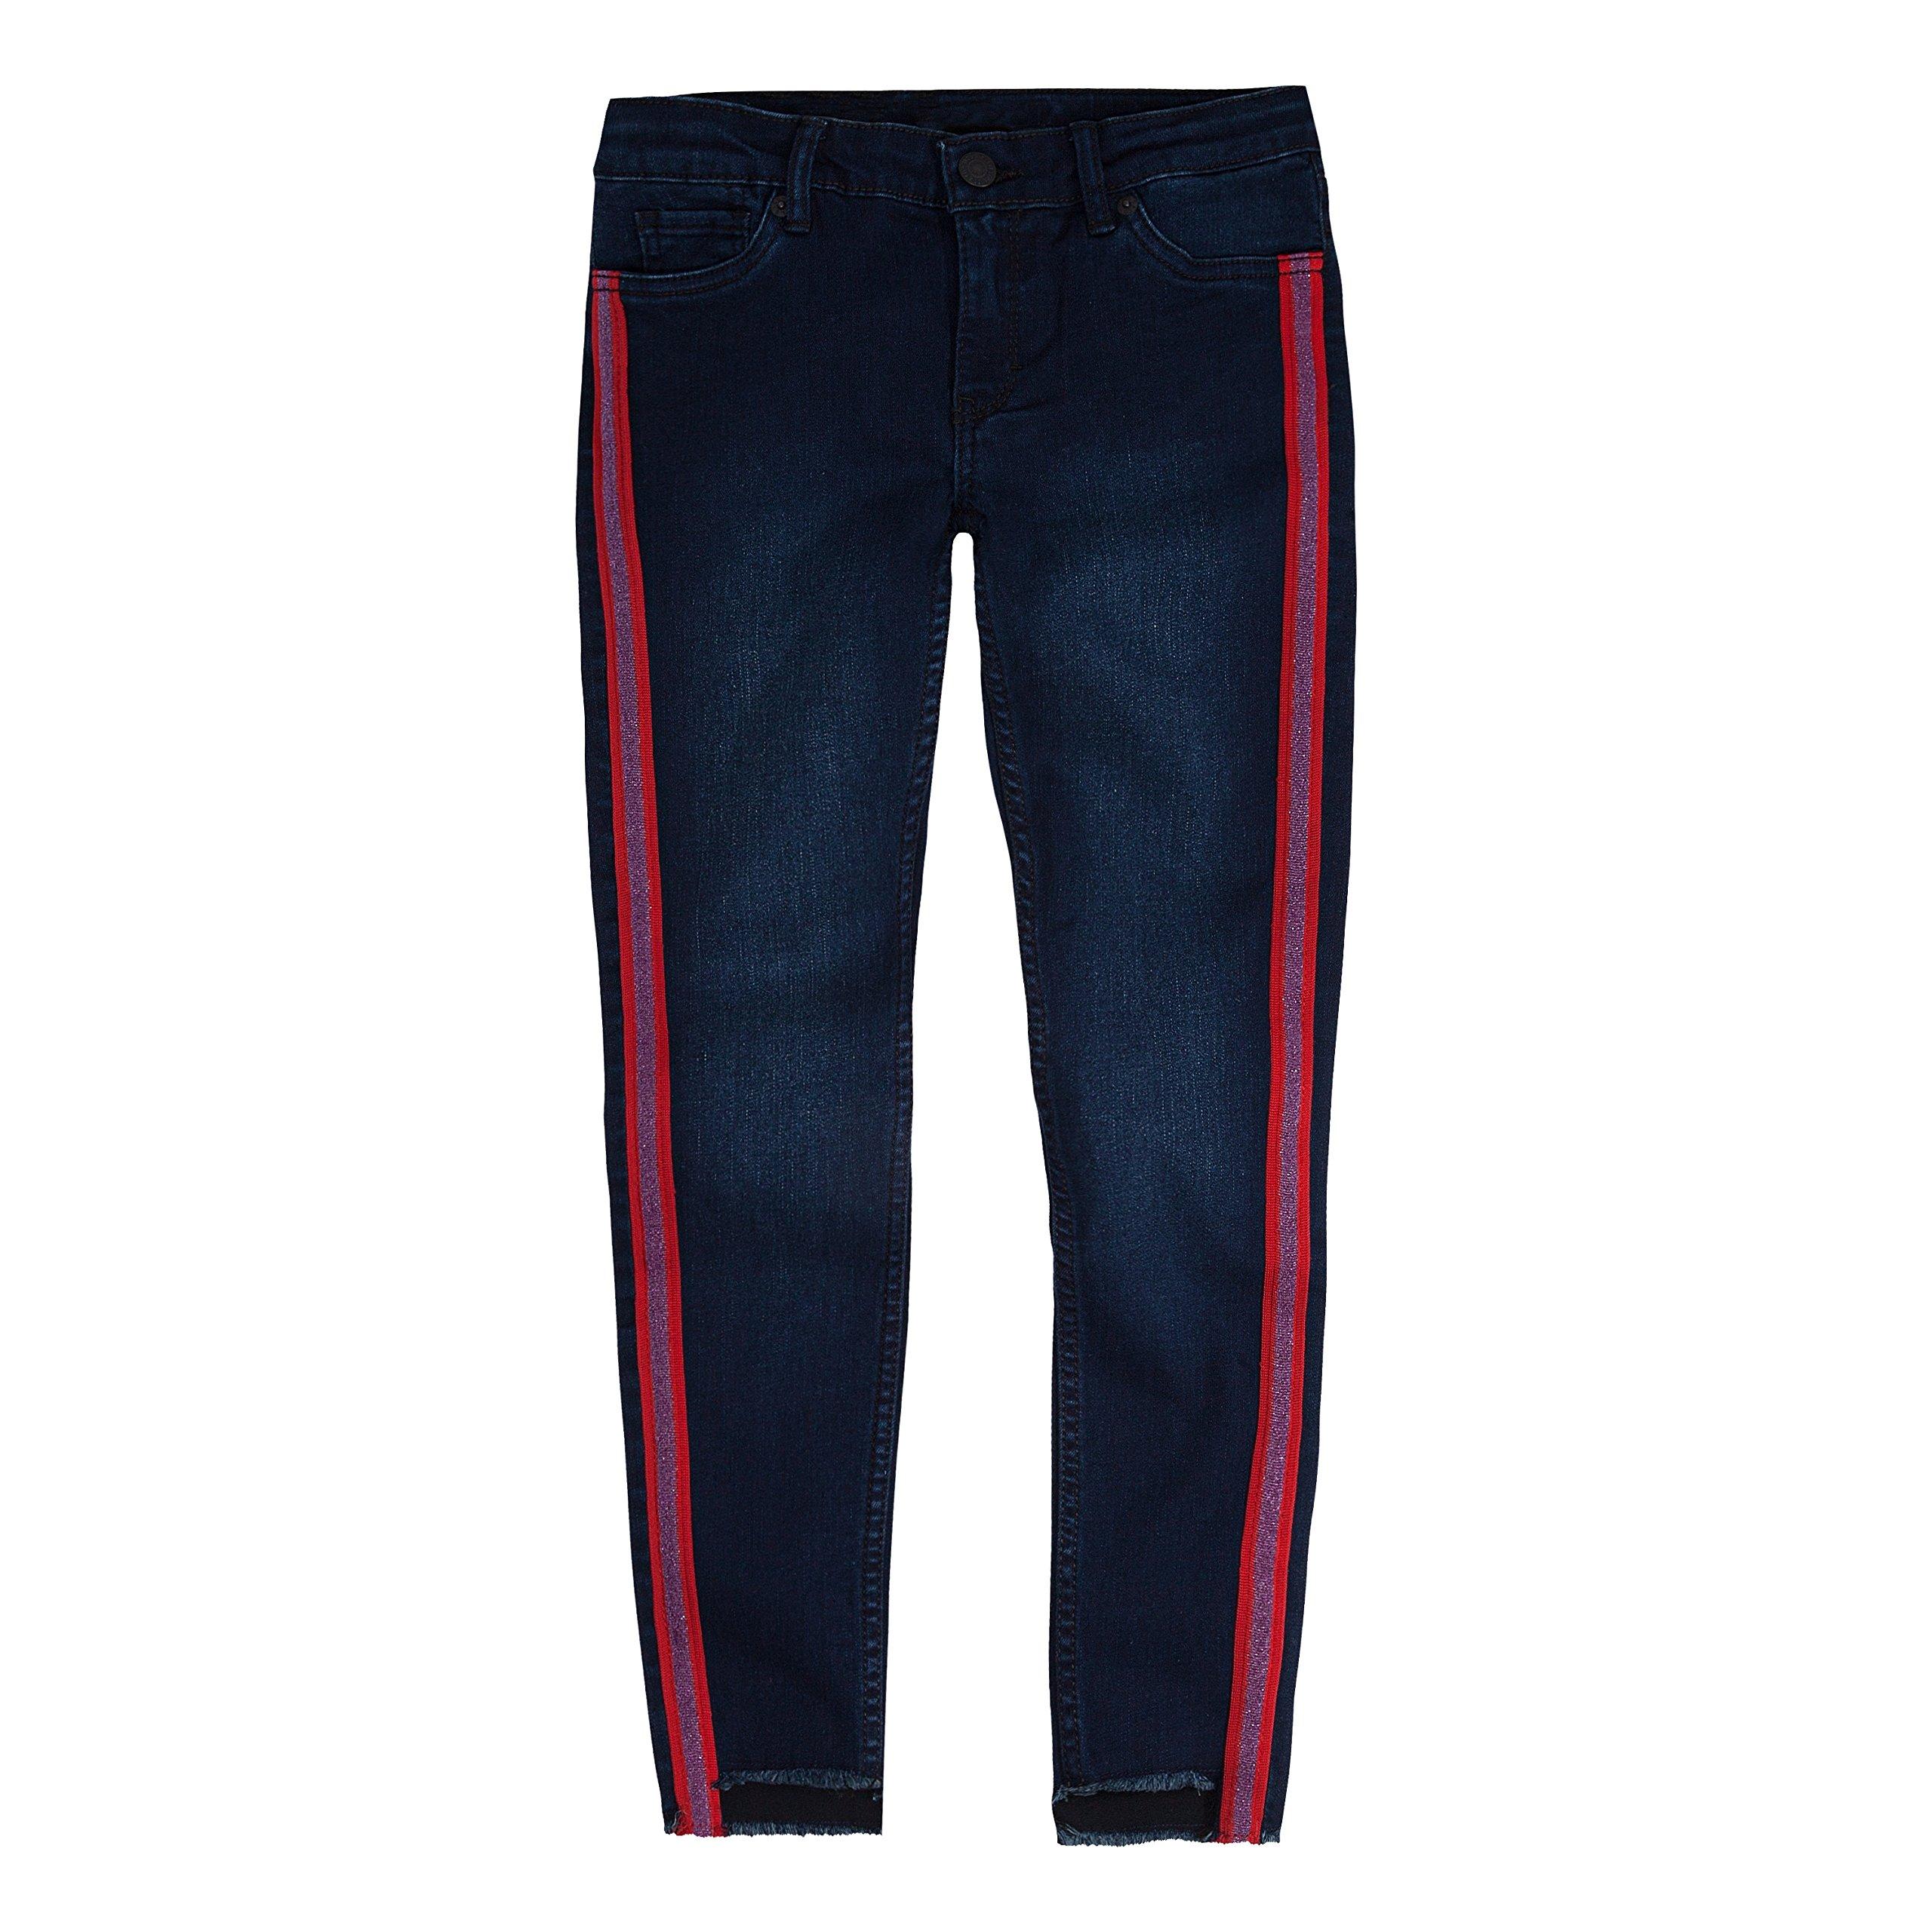 Levi's Big Girls 710 Ankle Super Skinny Jeans, Night Bird, 7